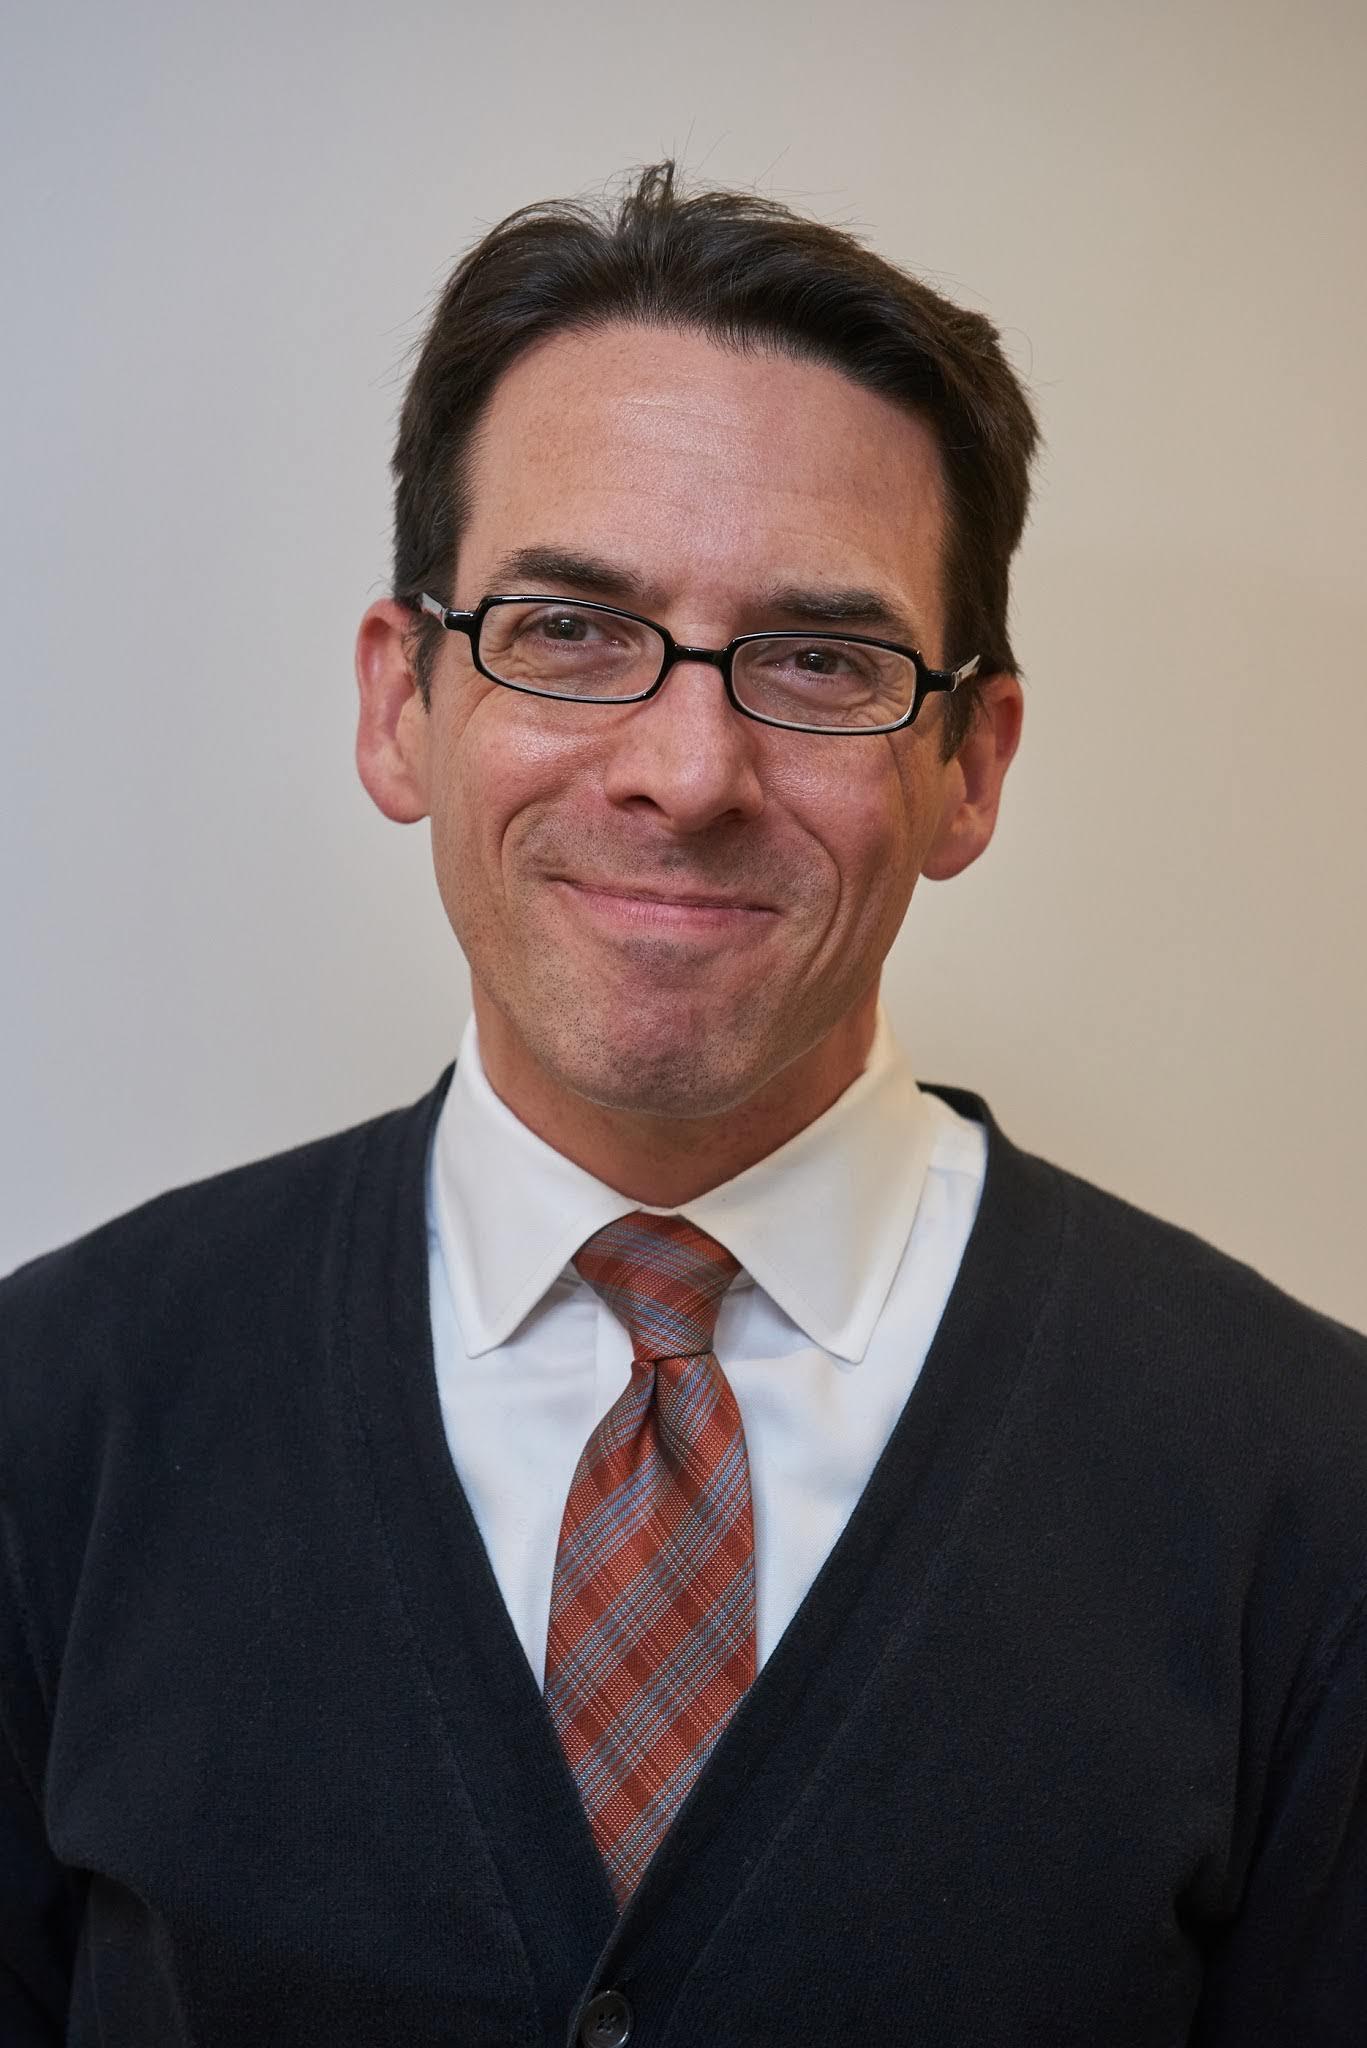 Wills, Jeff 11-2018.JPG